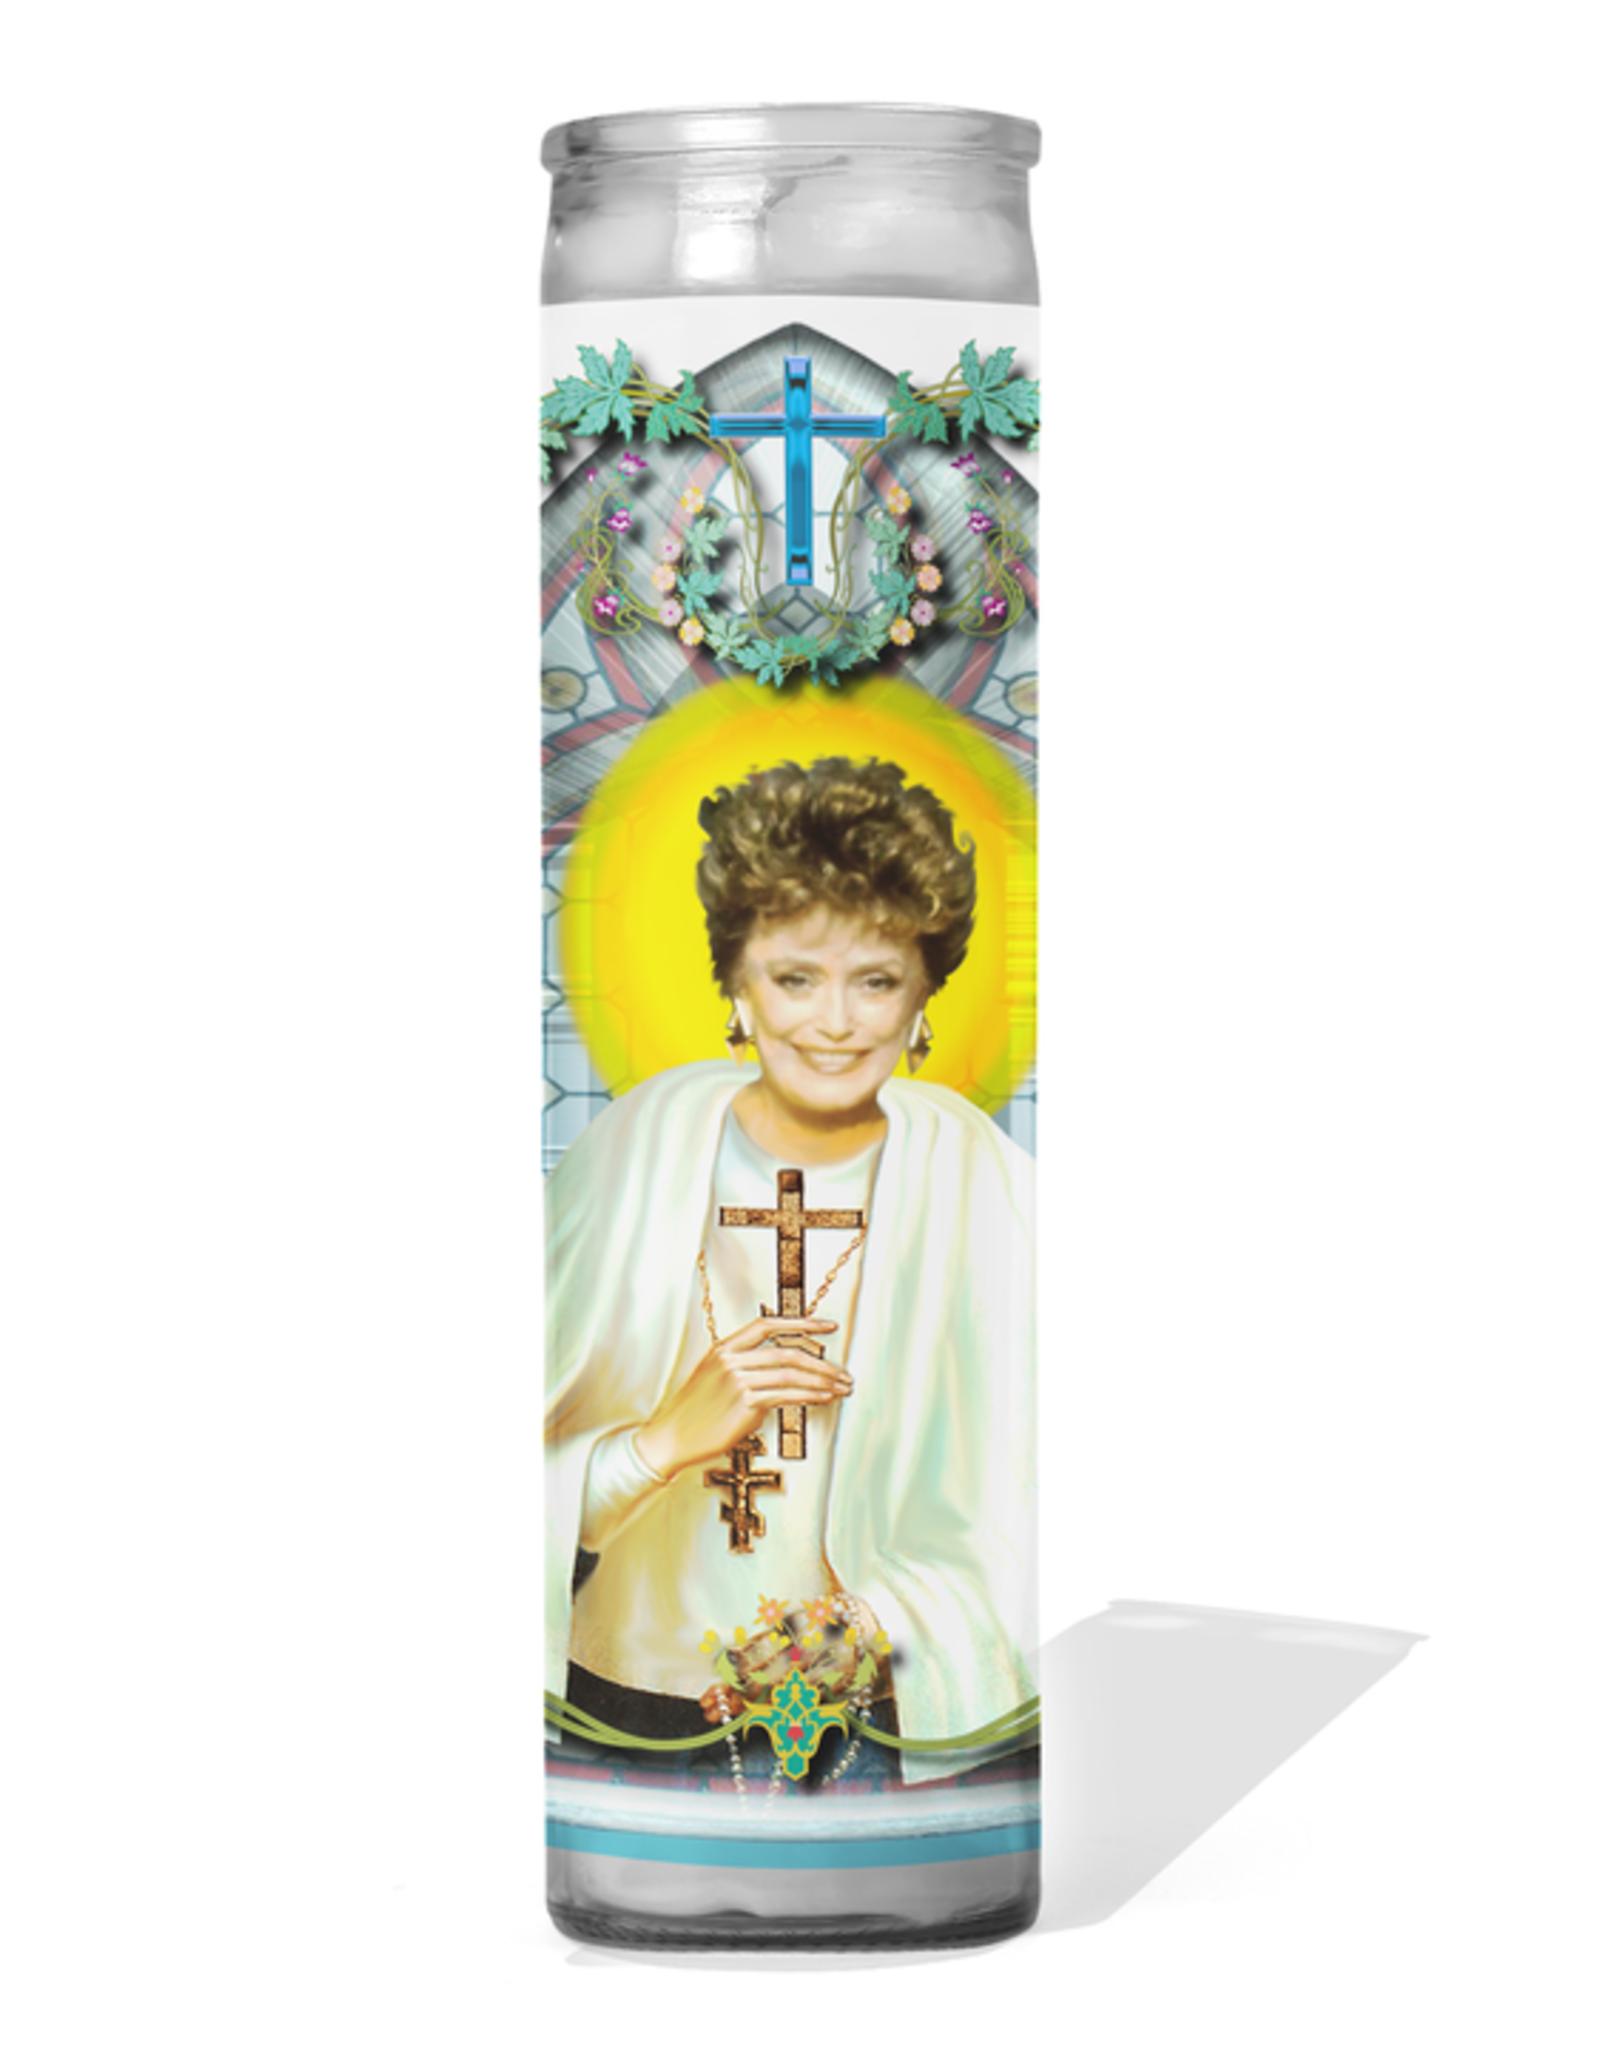 Calm Down Caren Blanche Prayer Candle